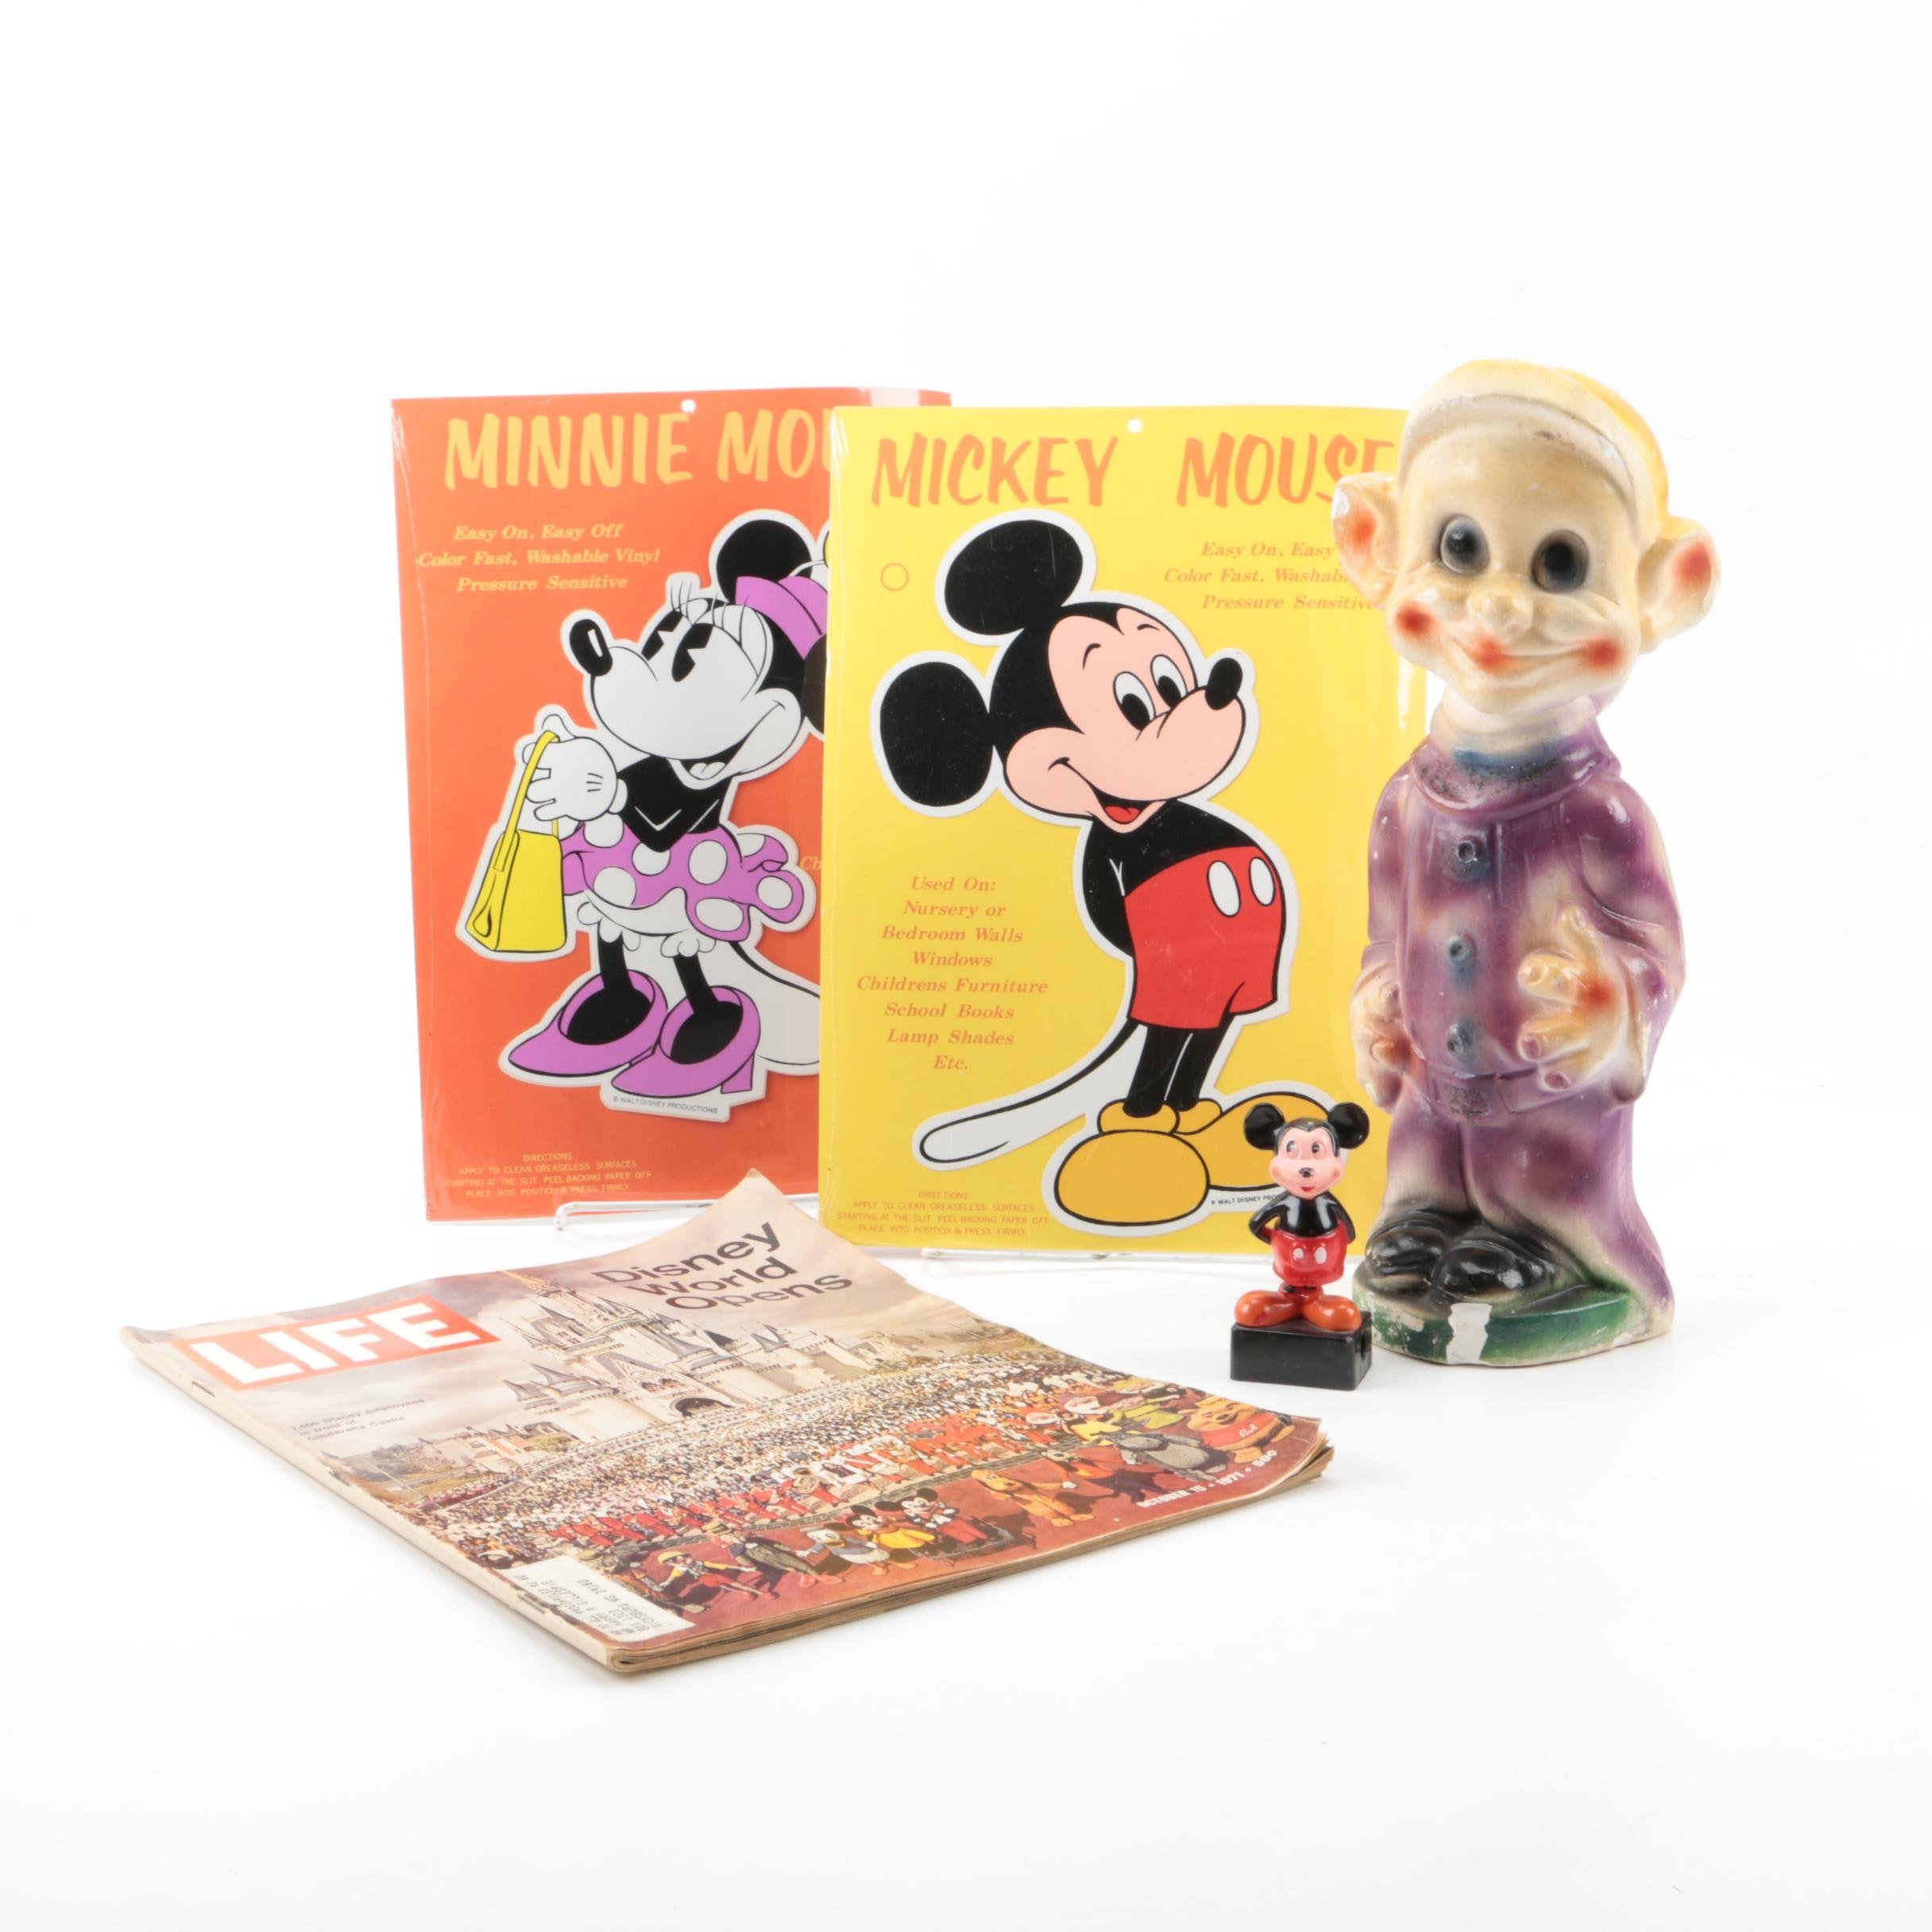 Disney Memorabilia Including Decals, Pencil Sharpener, and More